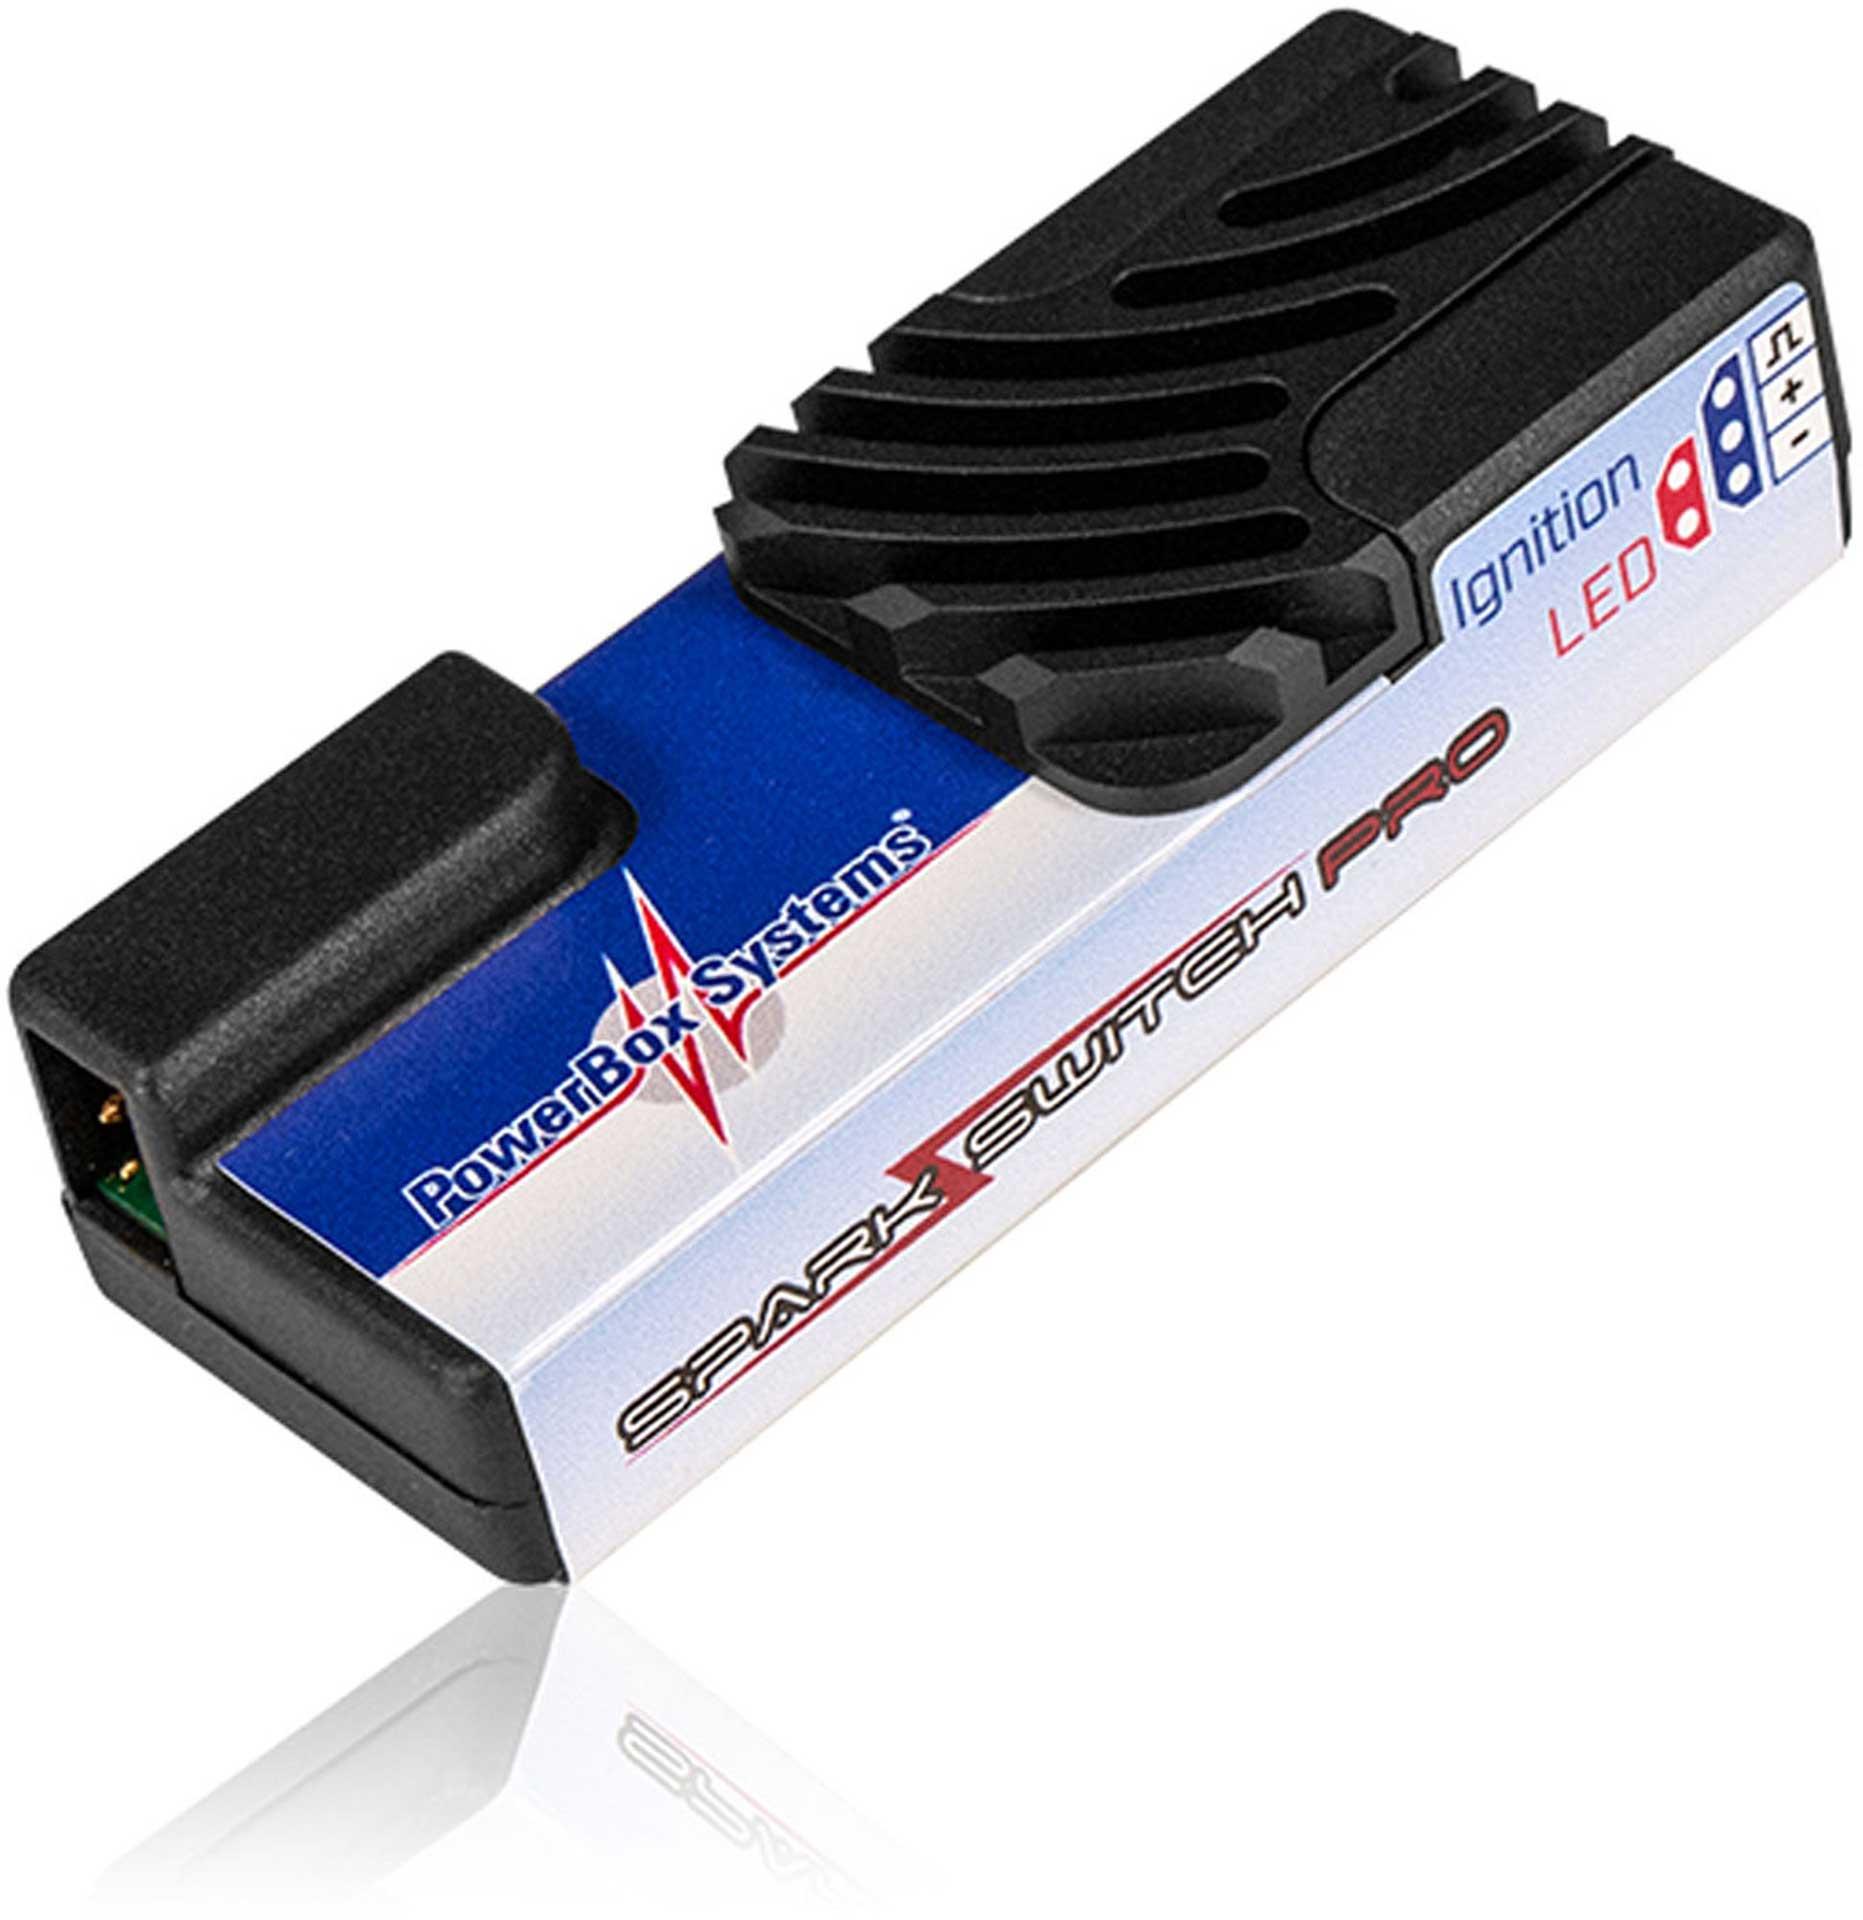 POWERBOX SYSTEMS SPARK SWITCH PRO FOR 6V 7,4V AND 12V